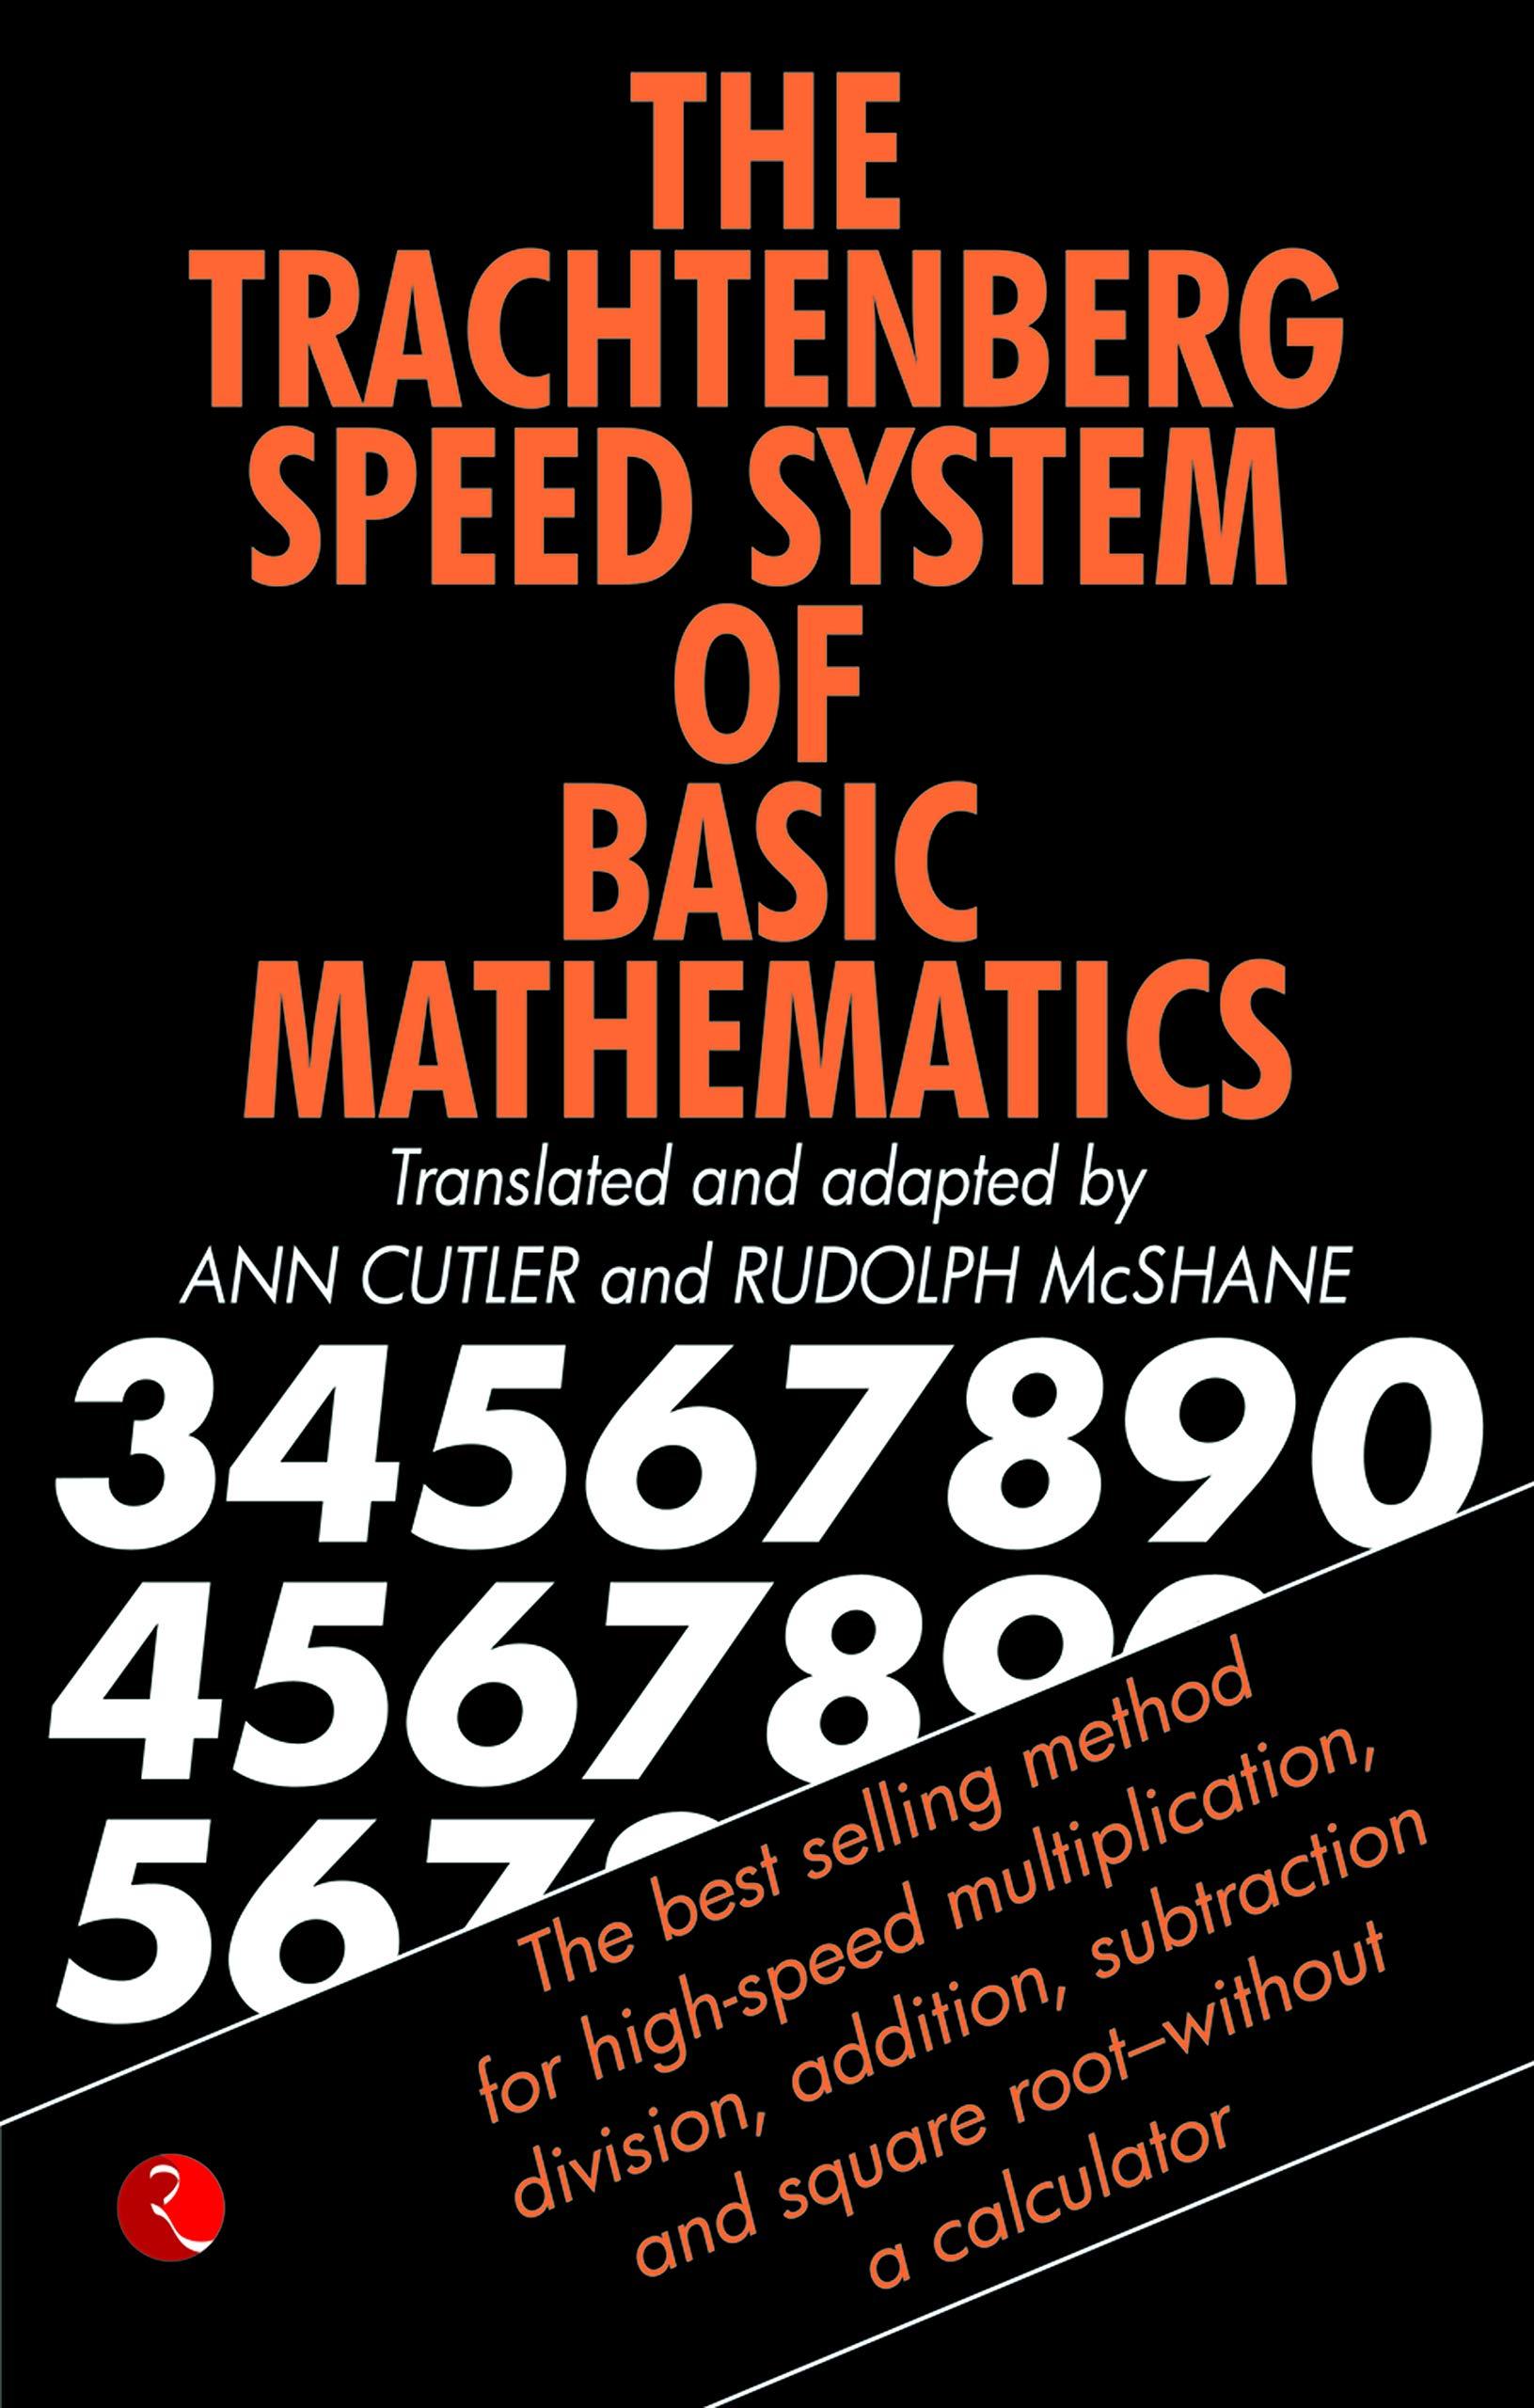 Buy The Trachtenberg Speed System of Basic Mathematics Book